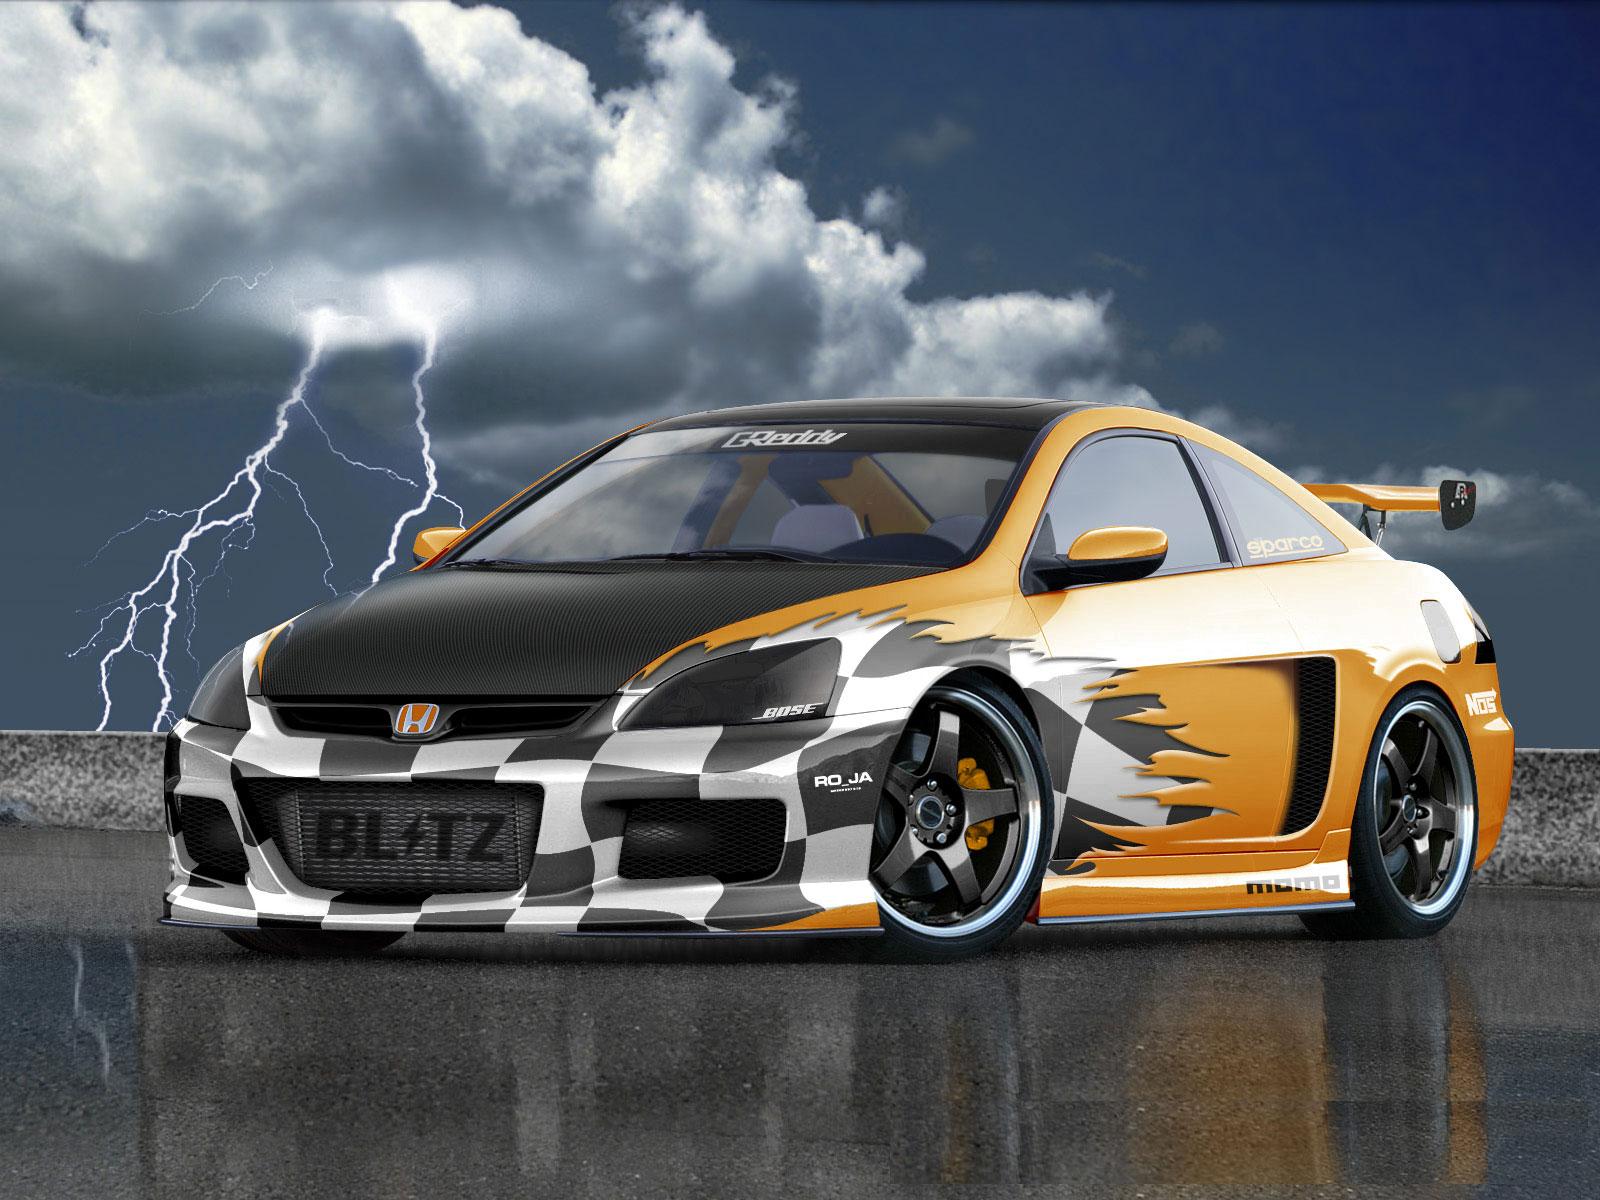 World Of Cars: Fastest Car Wallpaper